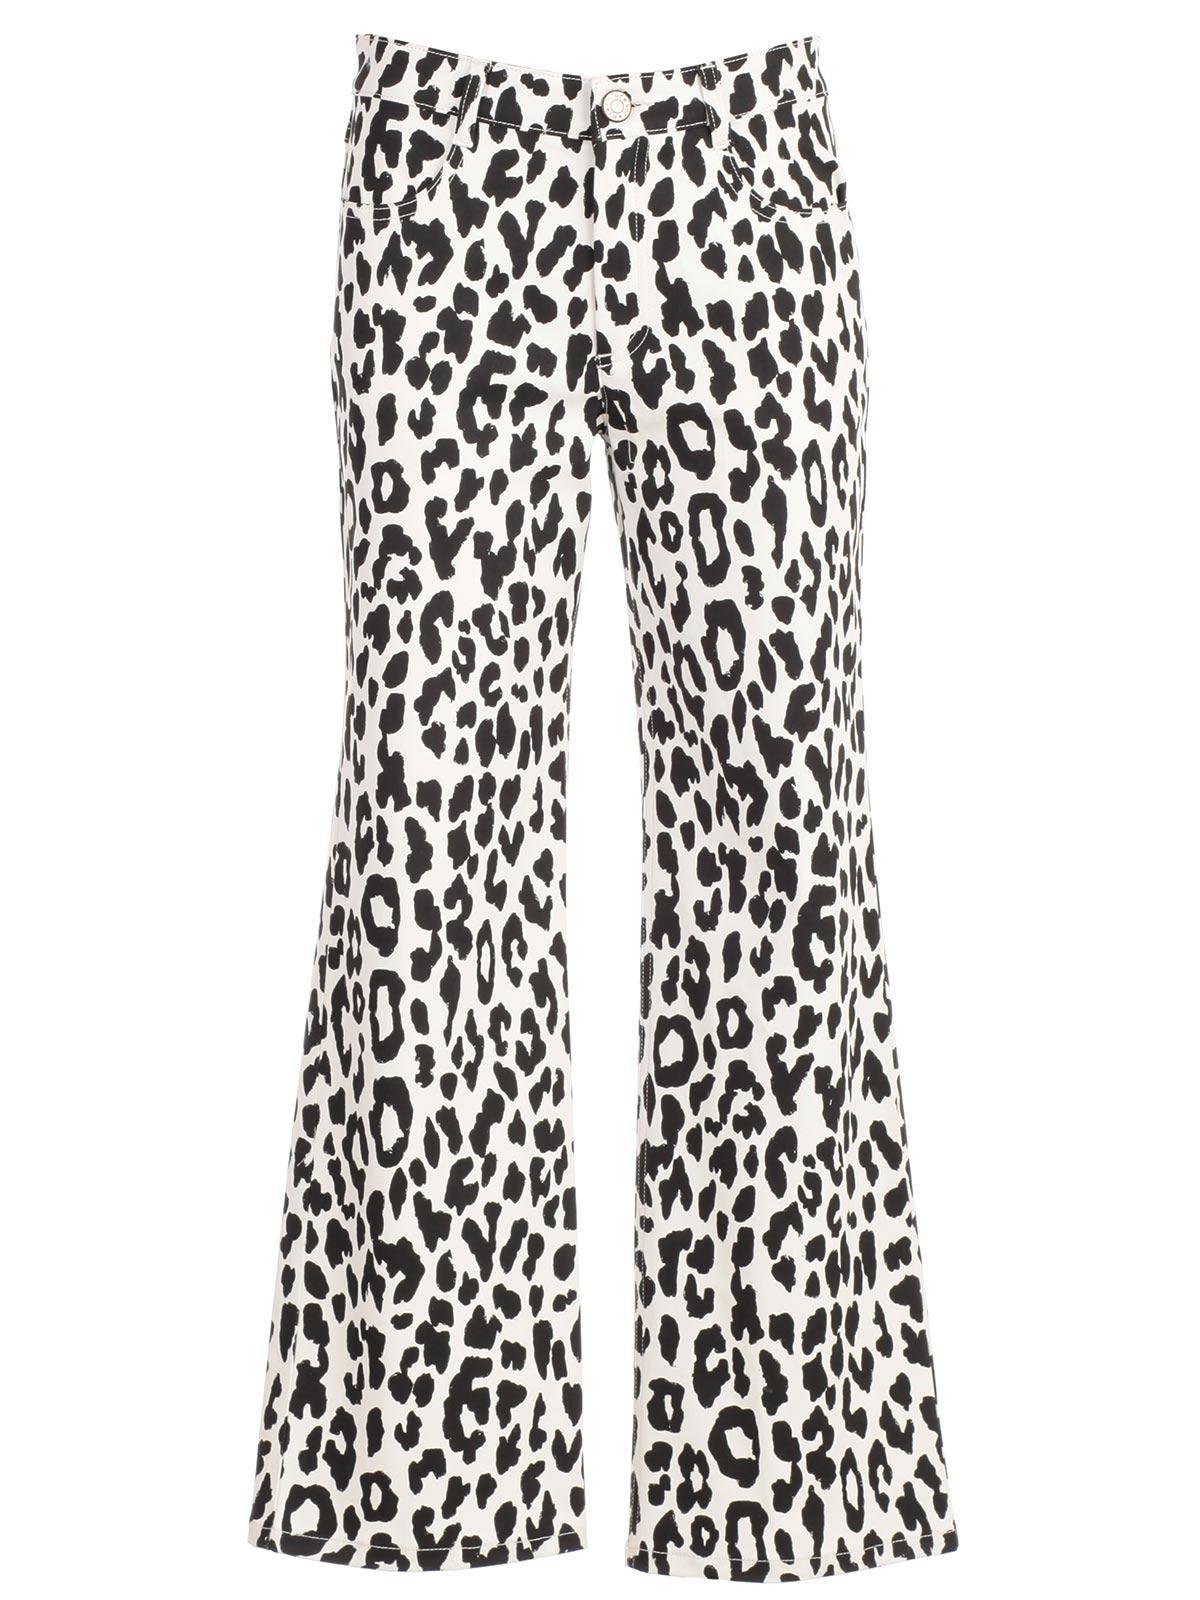 aaefd3fd4e43 See By ChloÉ Leopard Print Trousers | ModeSens